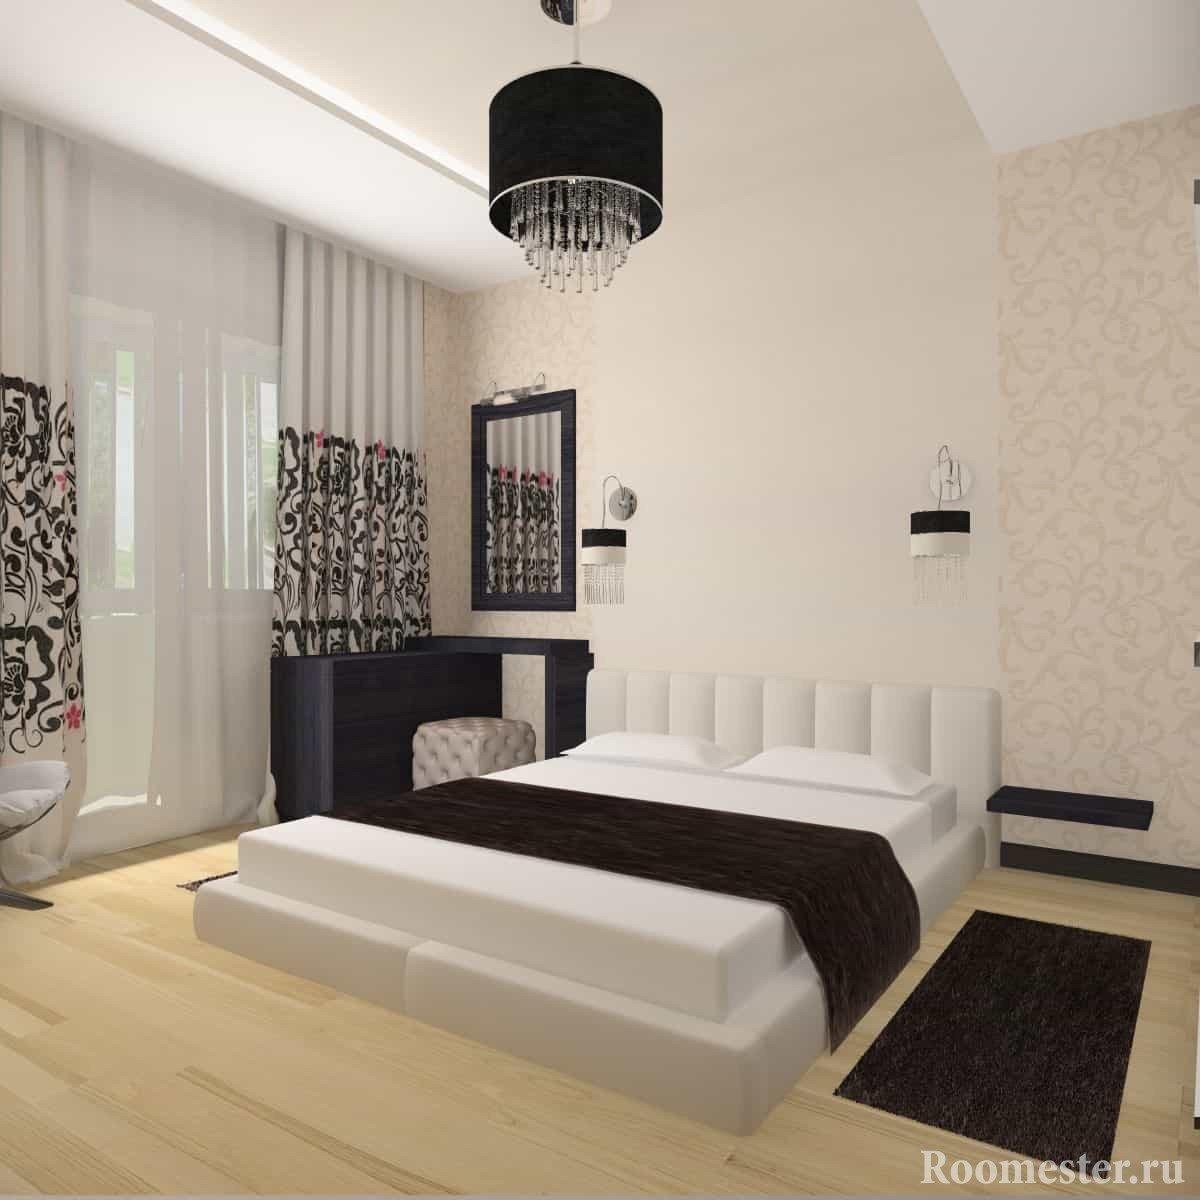 Design project bedroom 4 by 4 meters